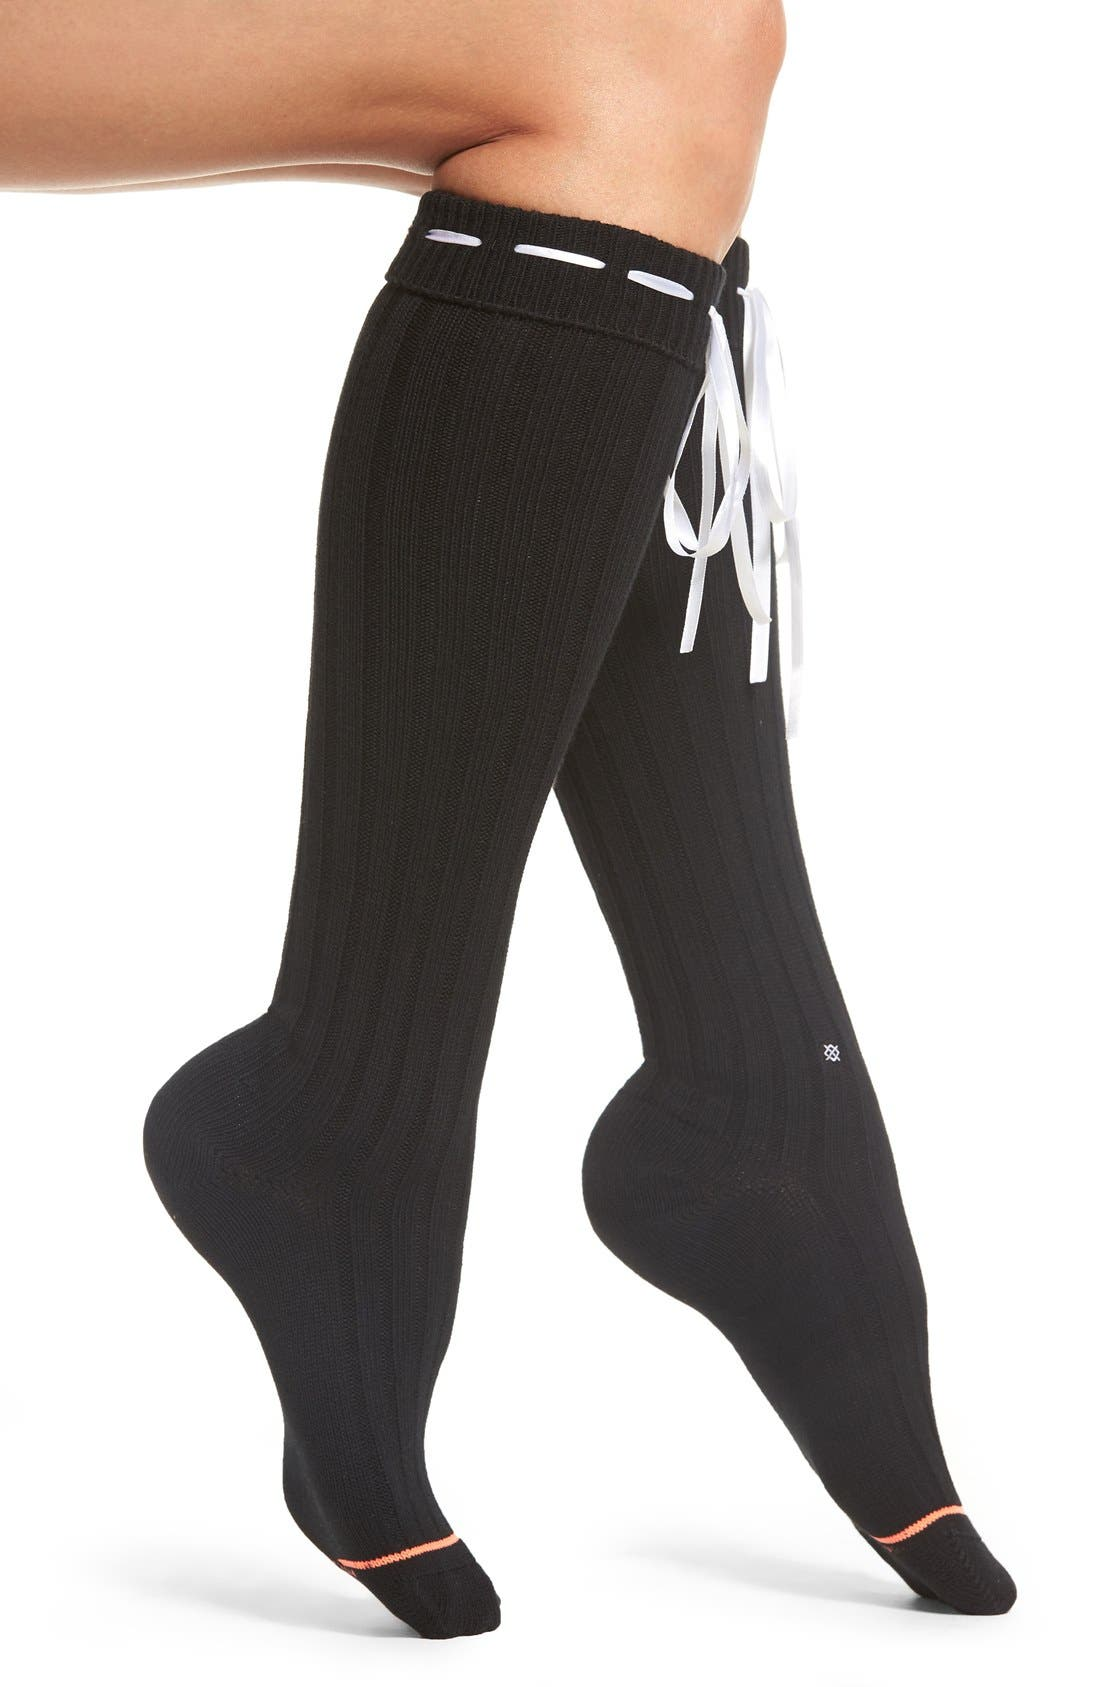 Main Image - Stance Dolores Knee High Socks